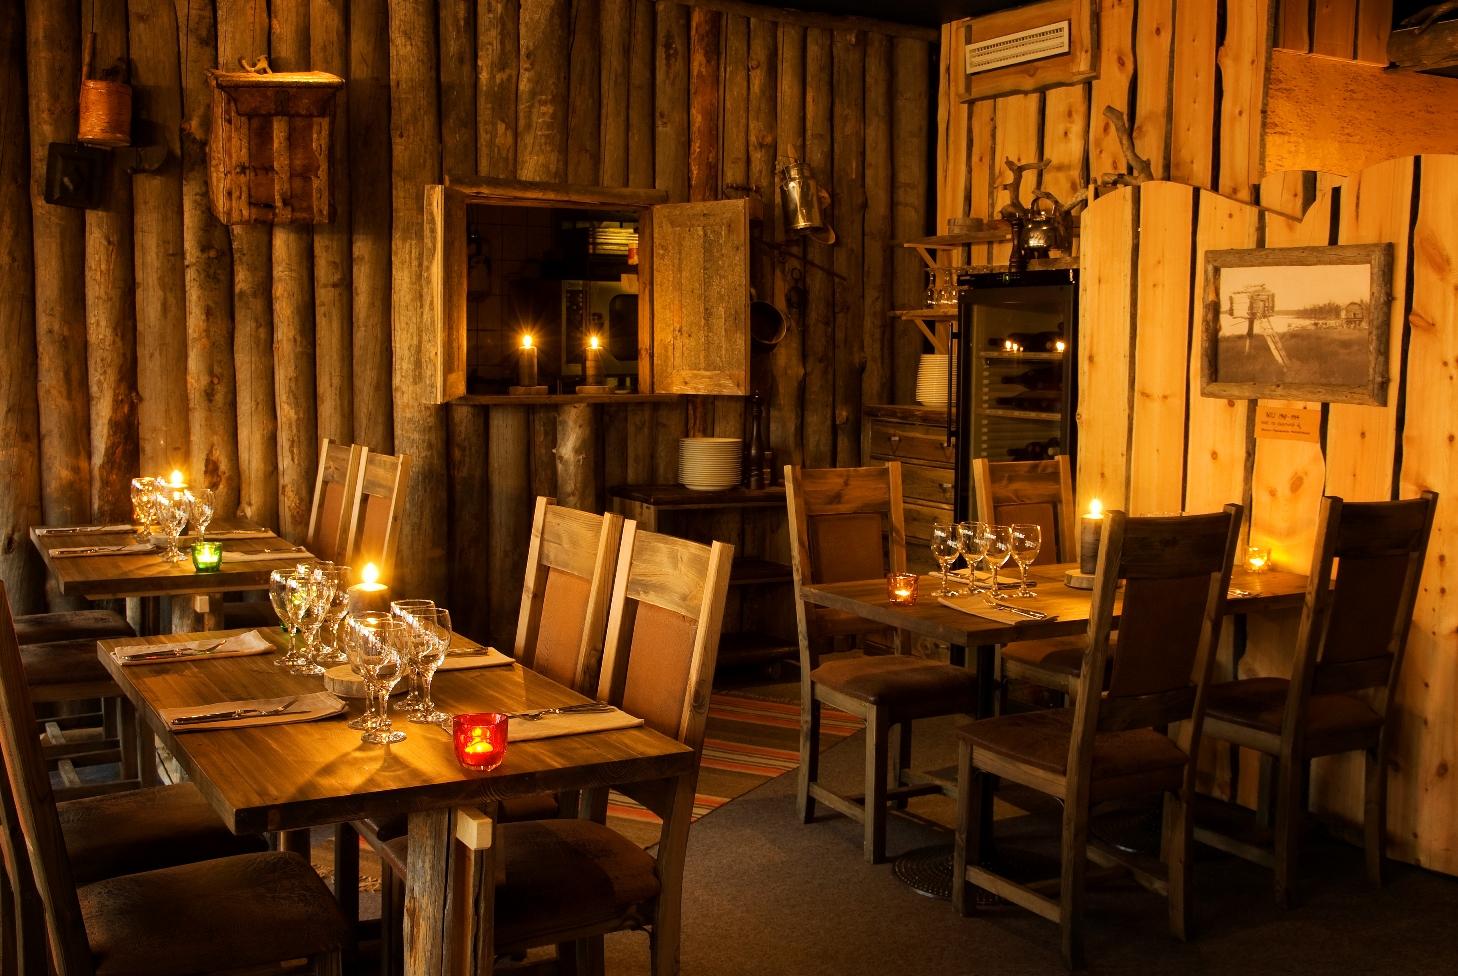 Nili Interior | Image Courtesy of Nili Restaurant